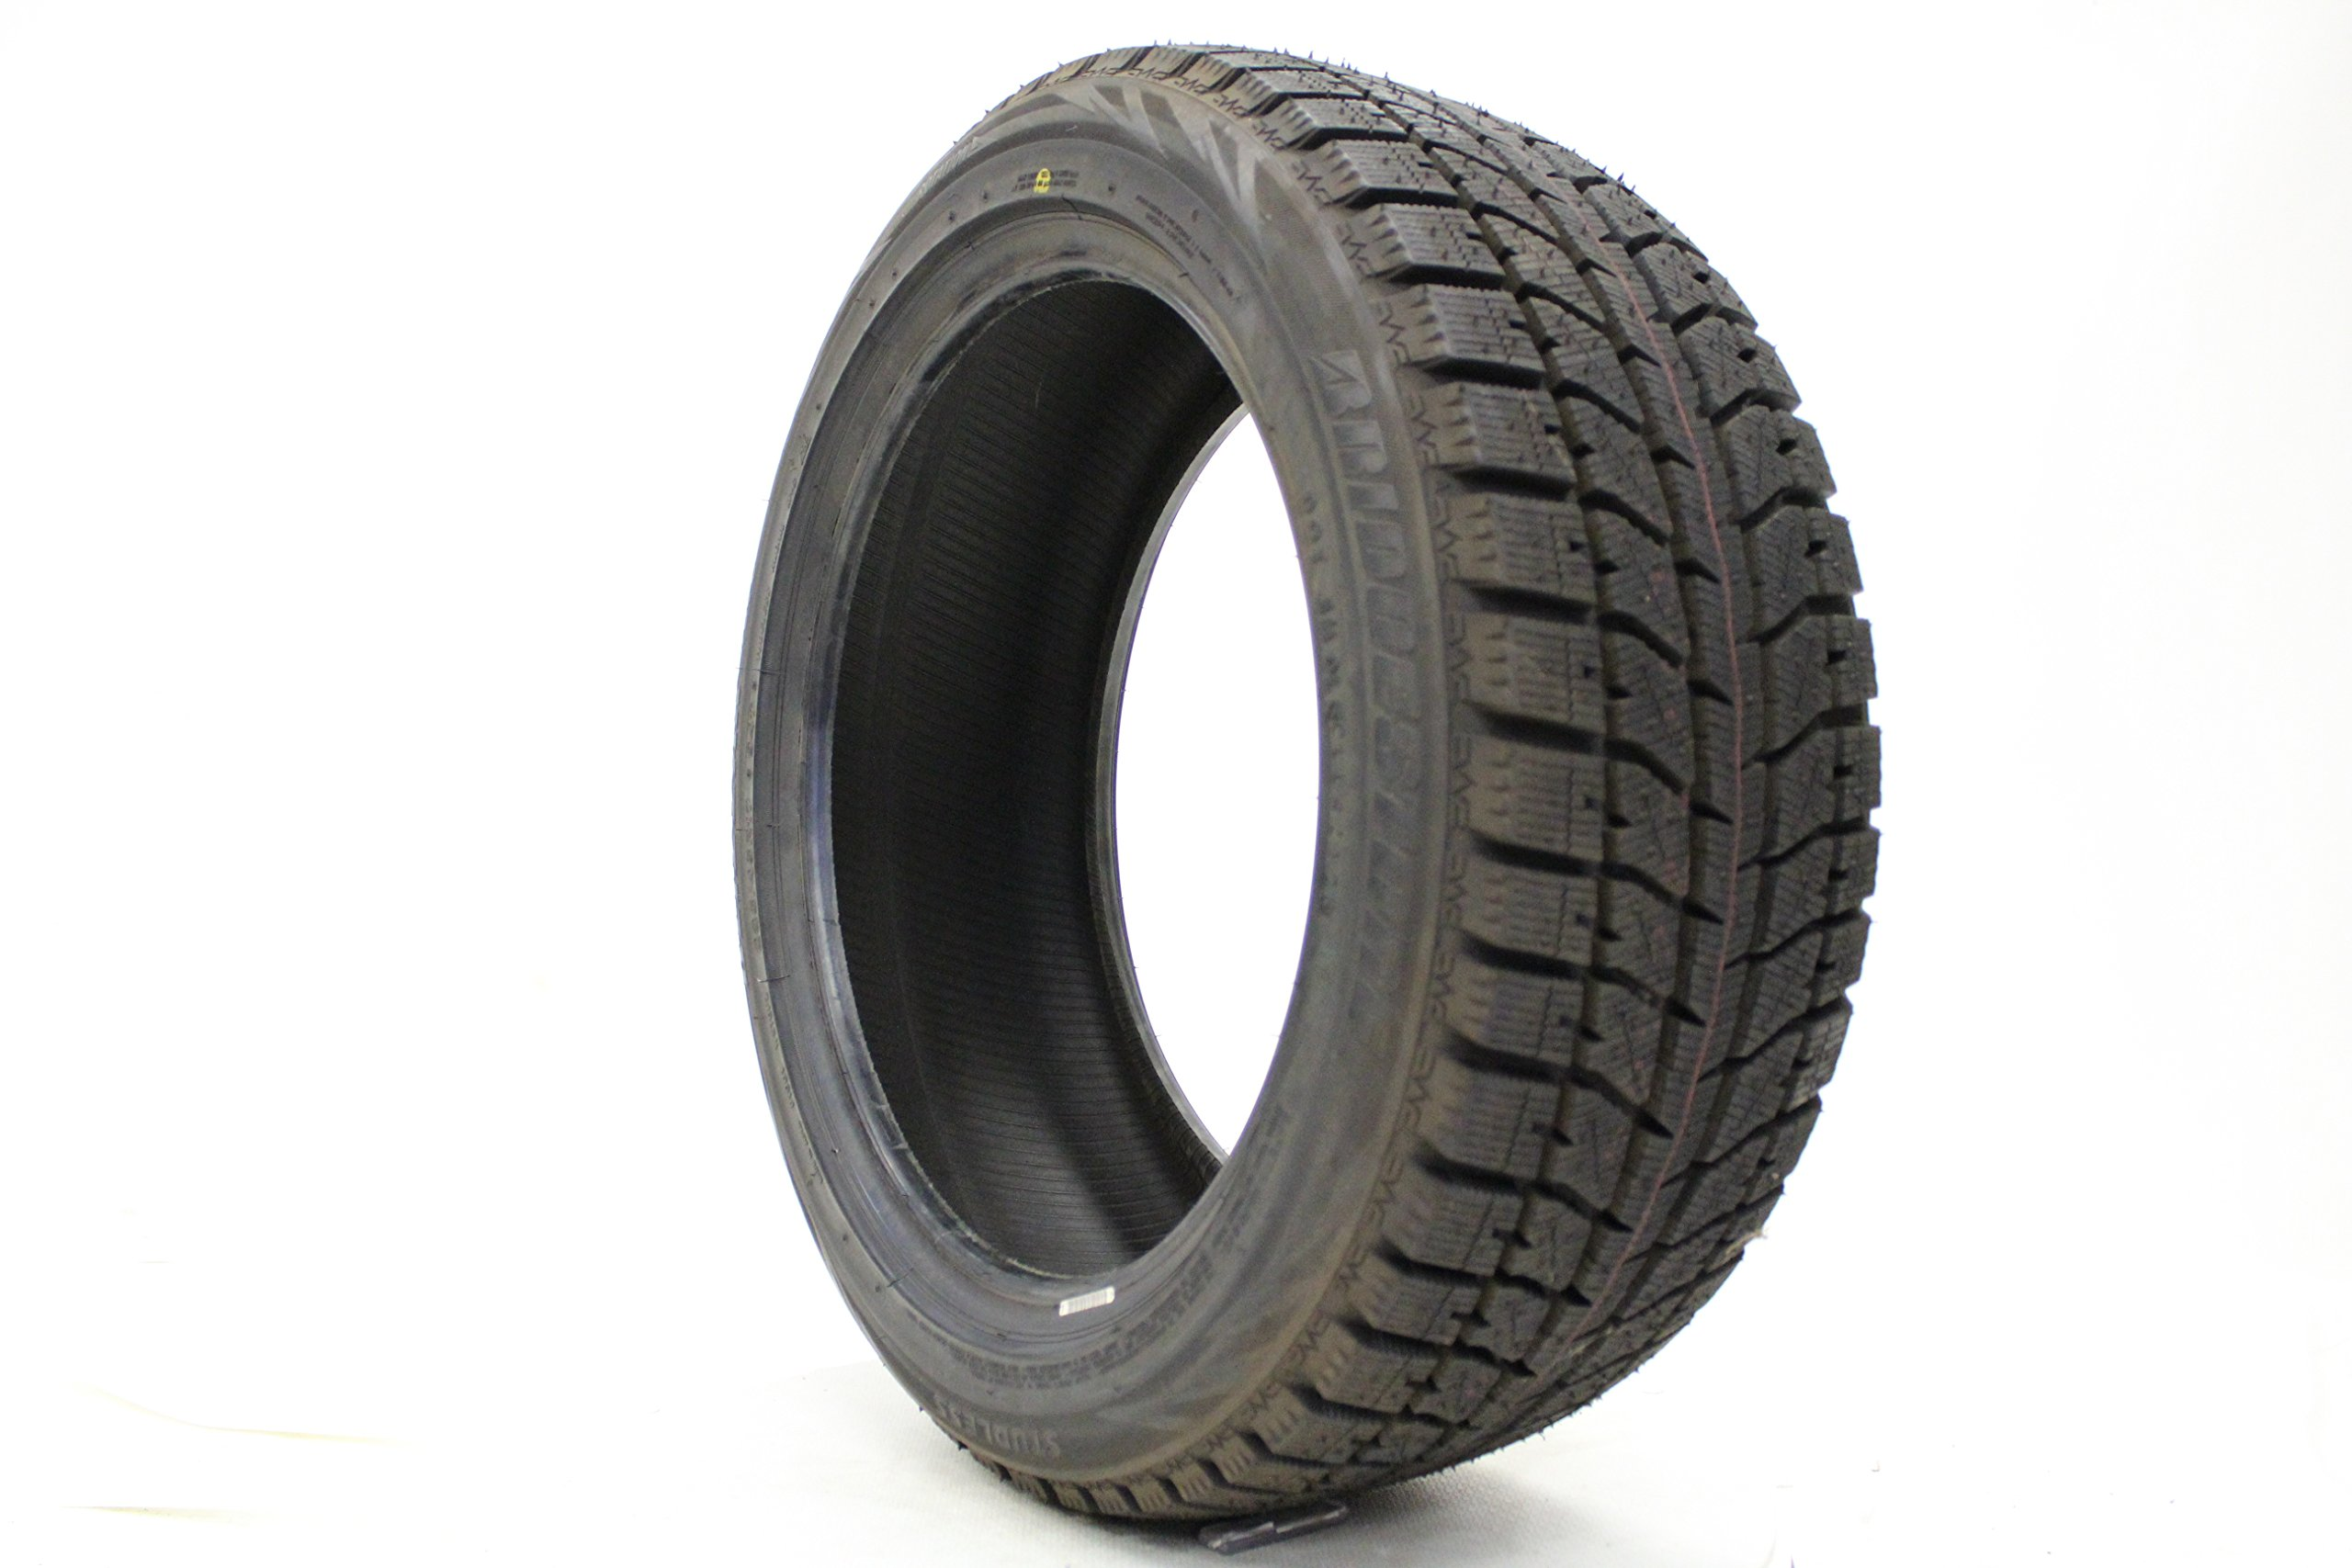 Bridgestone Blizzak WS70 Winter Radial Tire - 215/70R15 98T